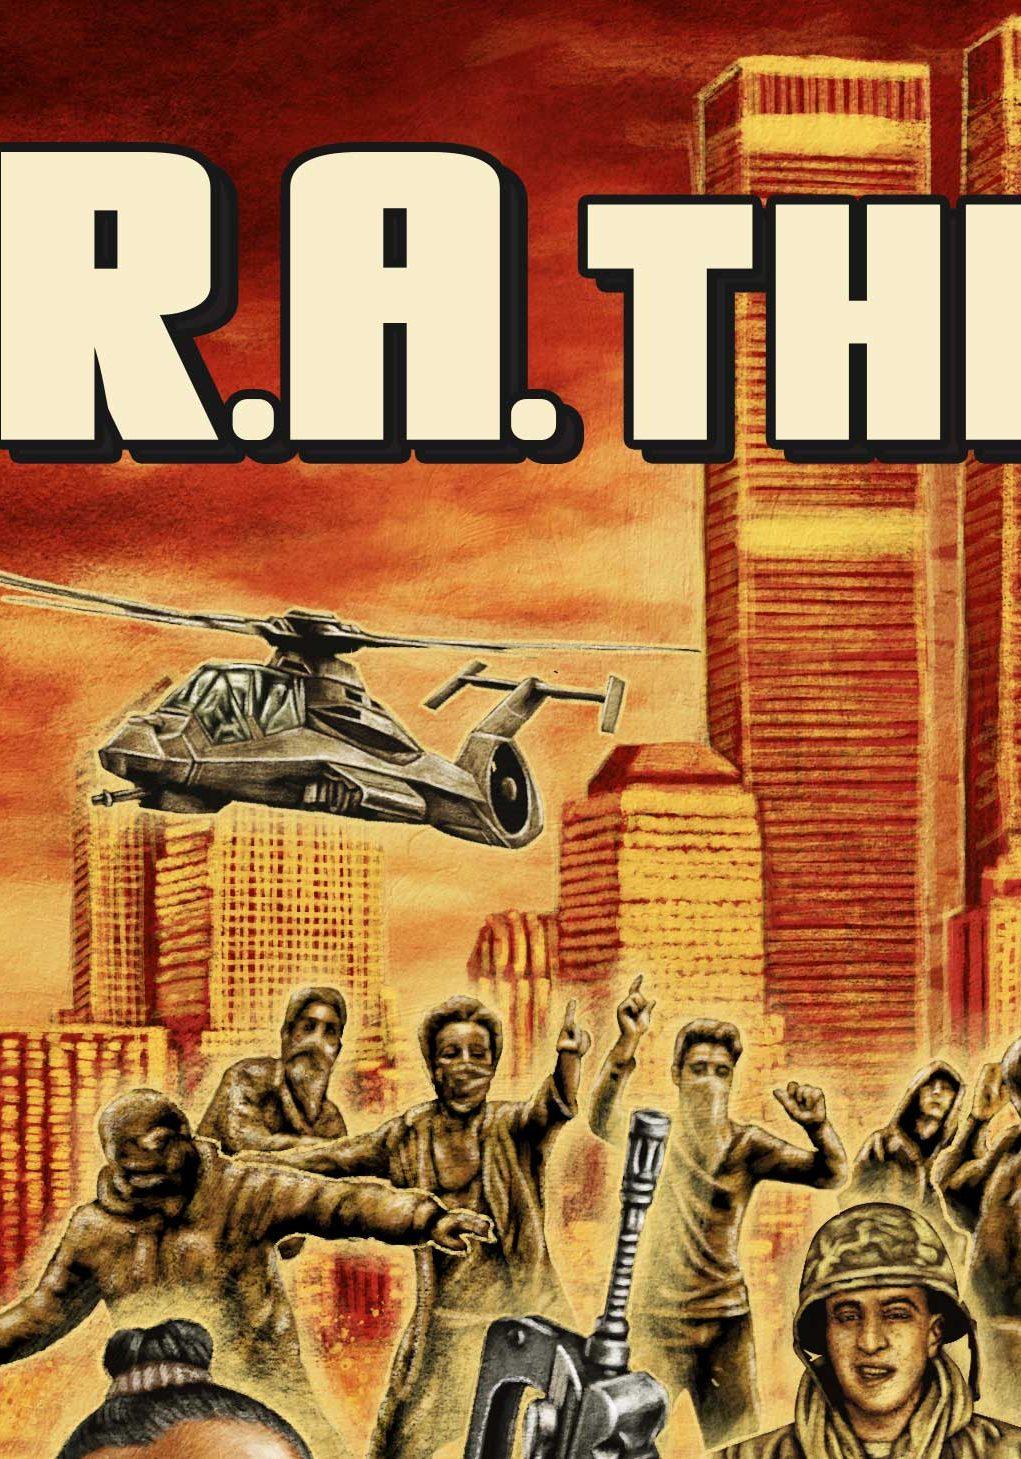 RA-The-Rugged-Man-all-my-heros-2